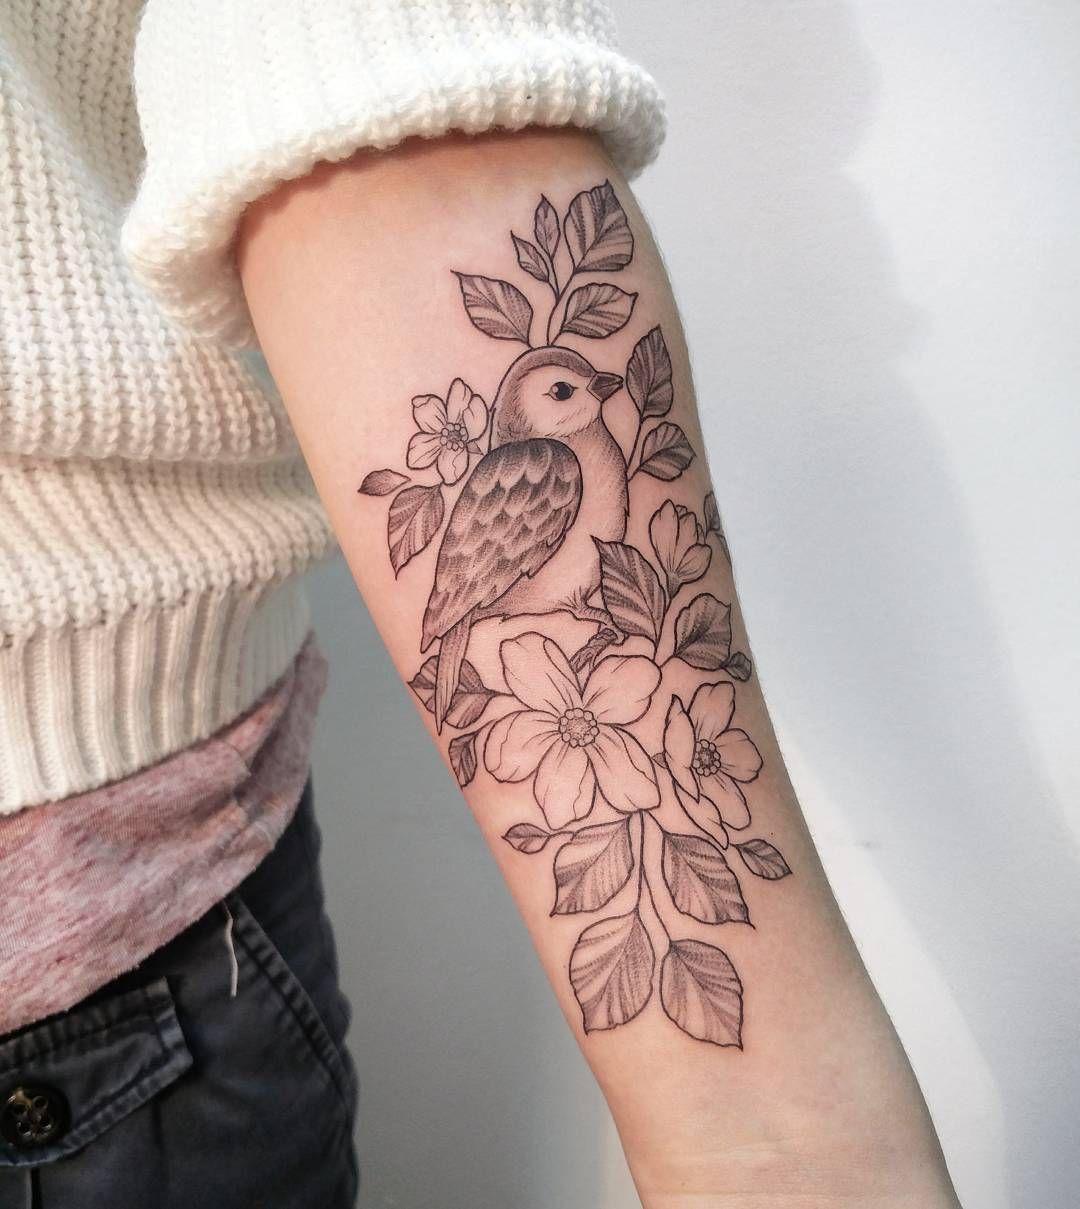 Forearm Feminine Bird Tattoo Irene Bogachuk Tattoos Irene intended for measurements 1080 X 1209